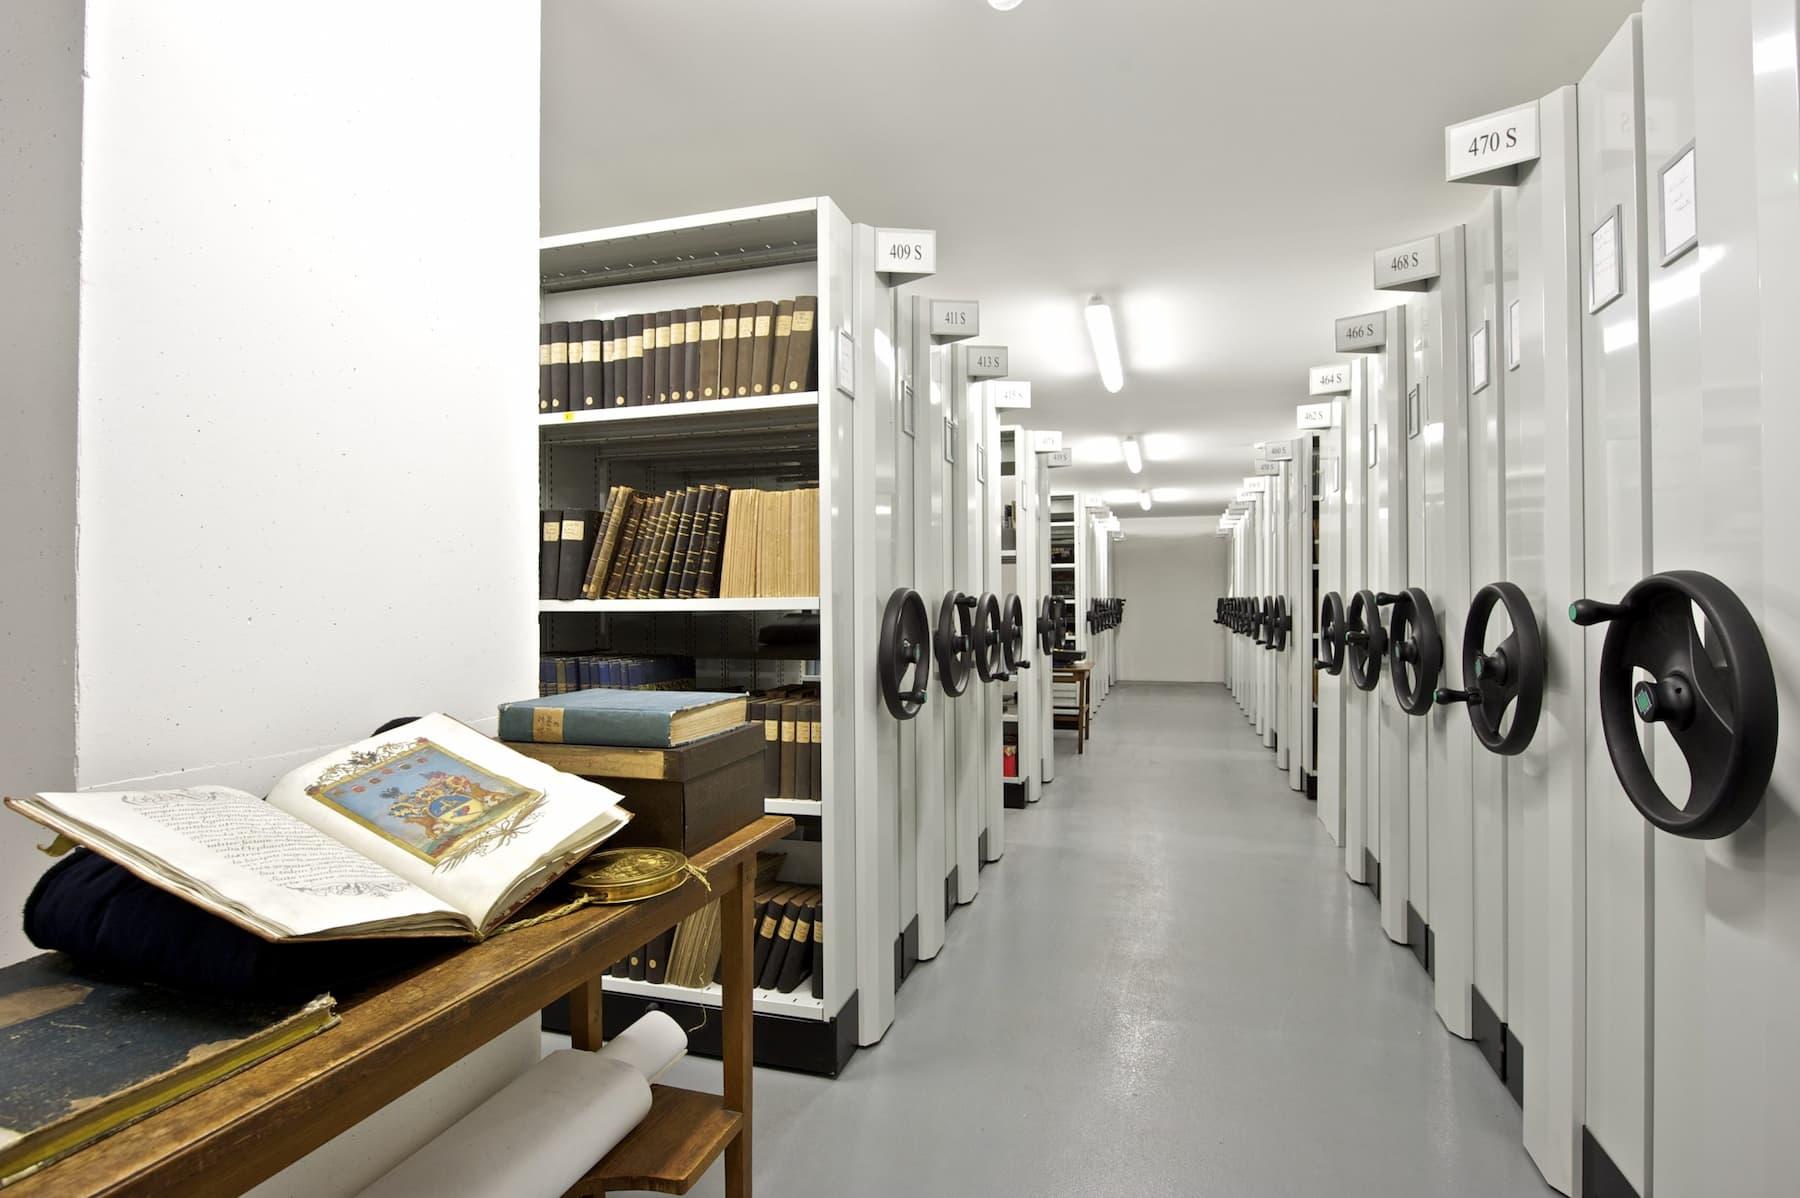 rayonnage bibliotheque